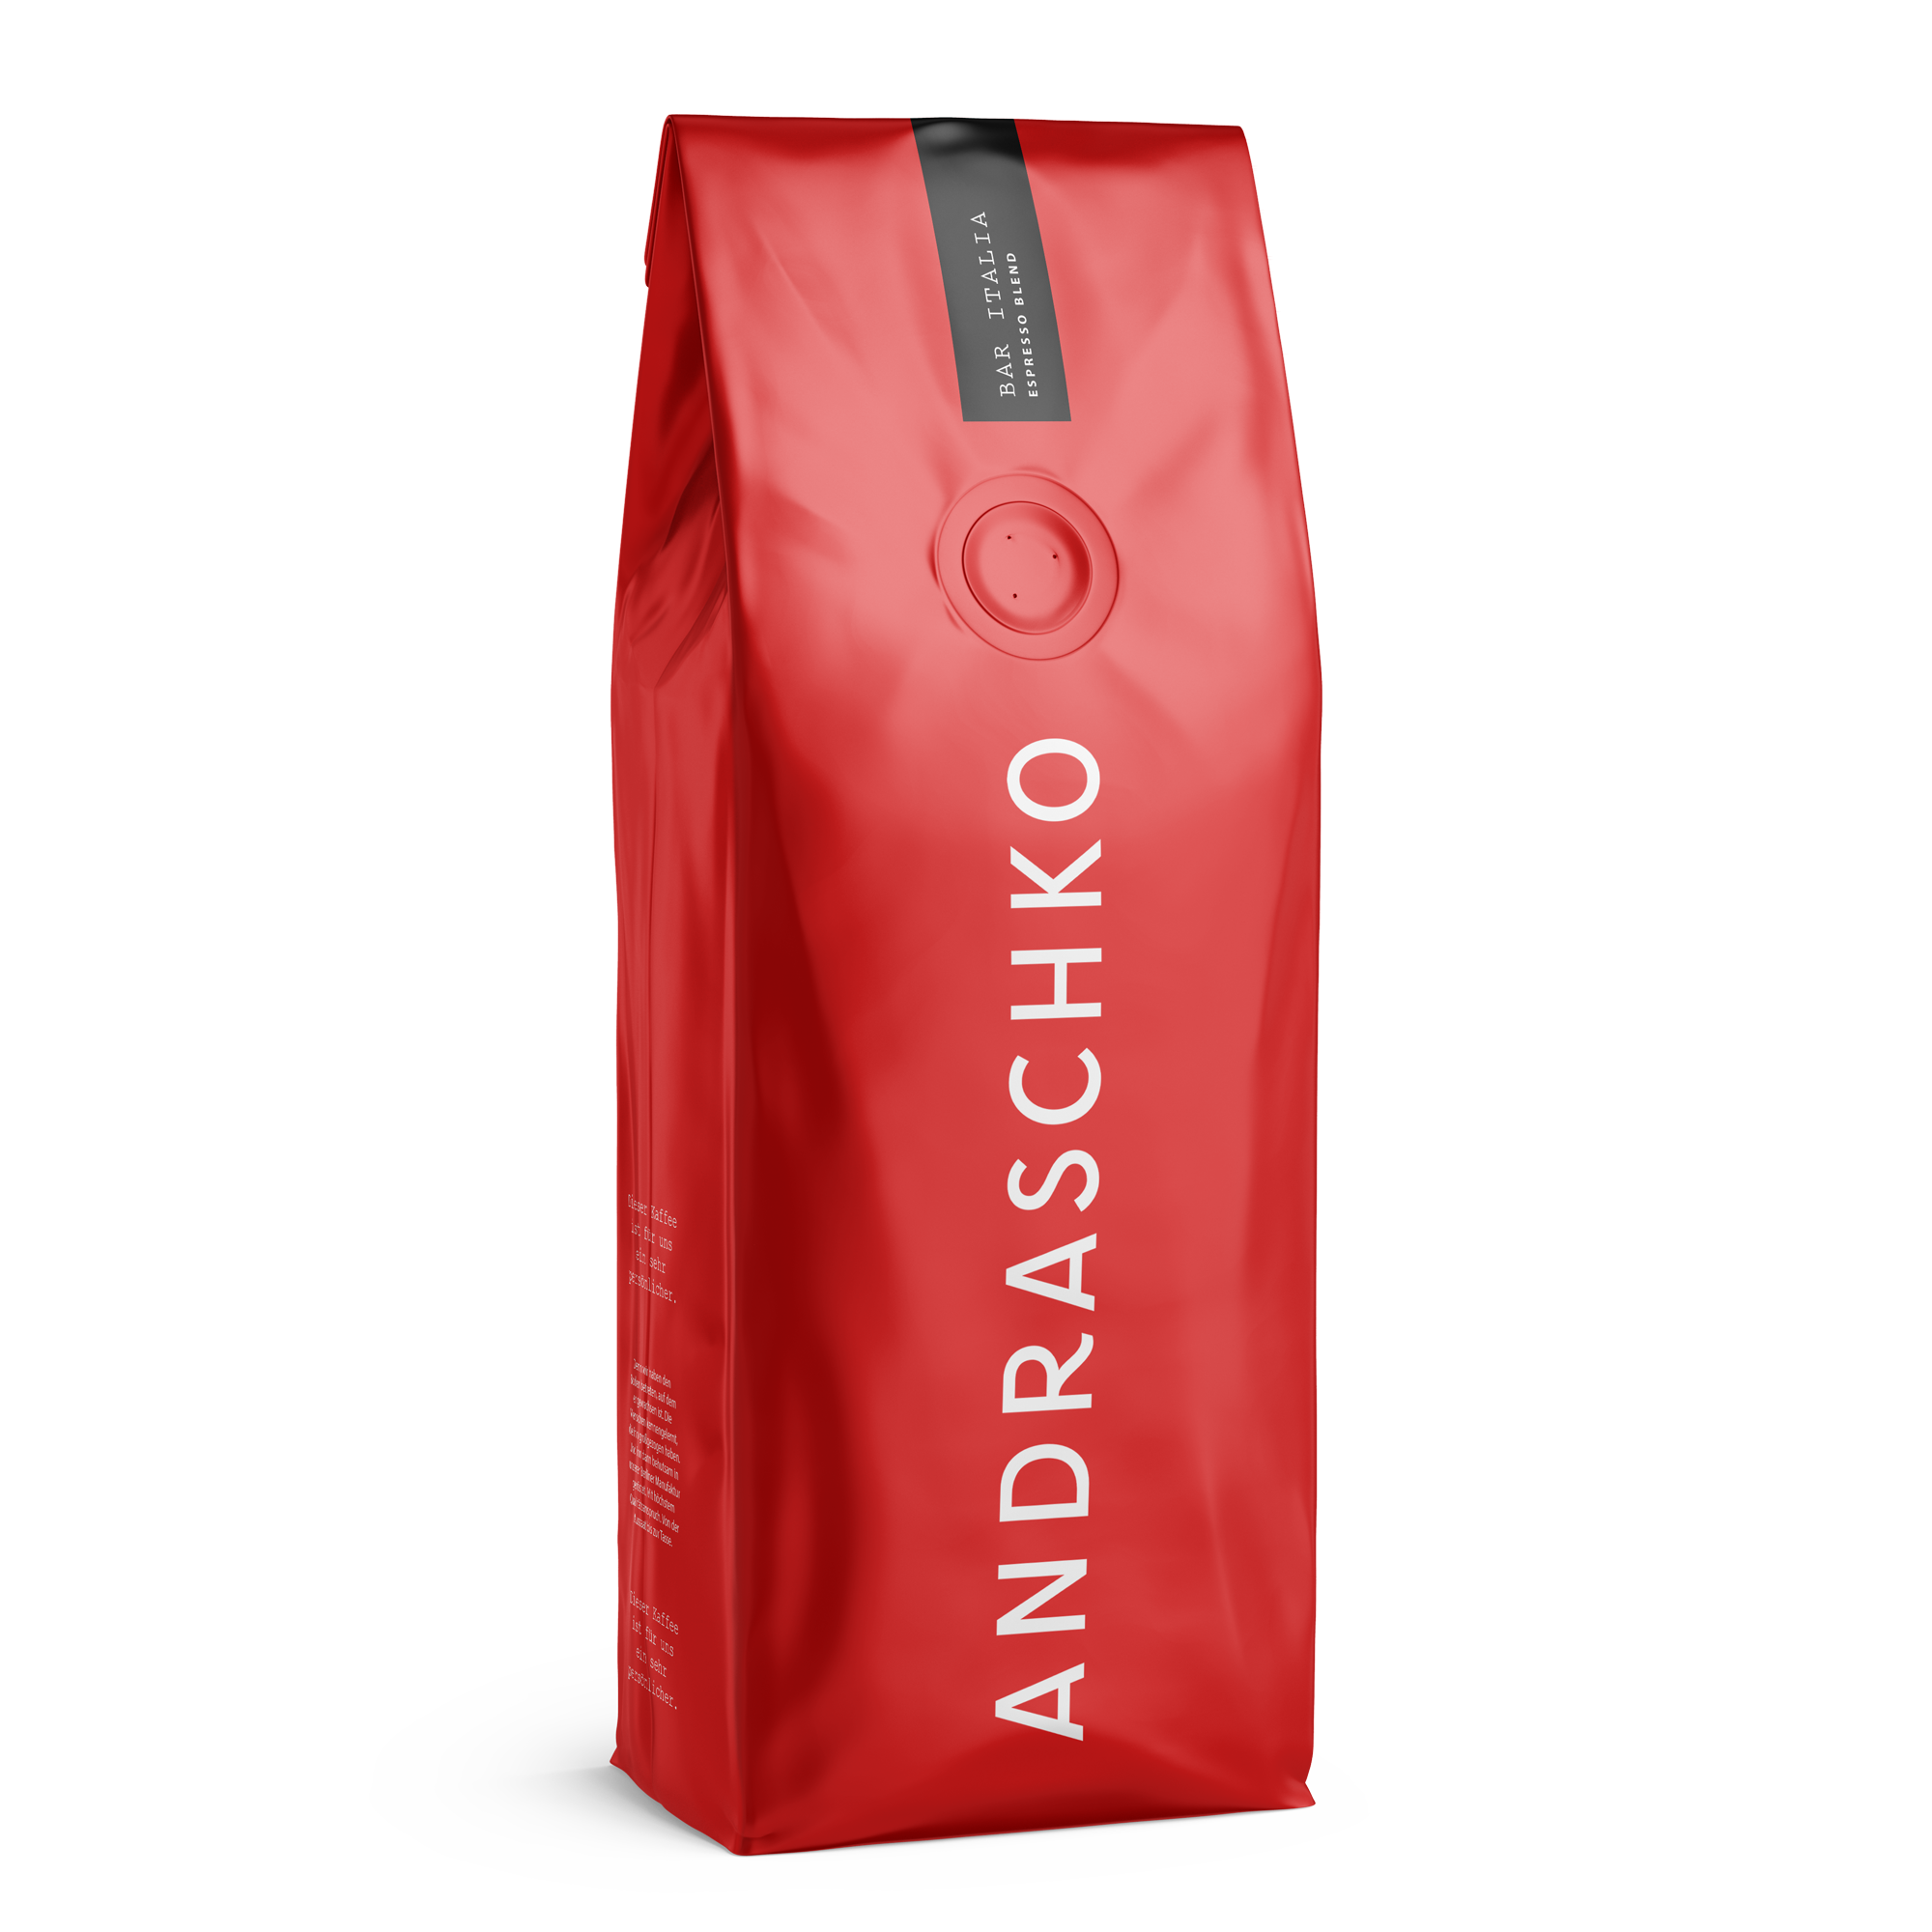 6408b59367ccec Geschenkbox Espresso Blends Special